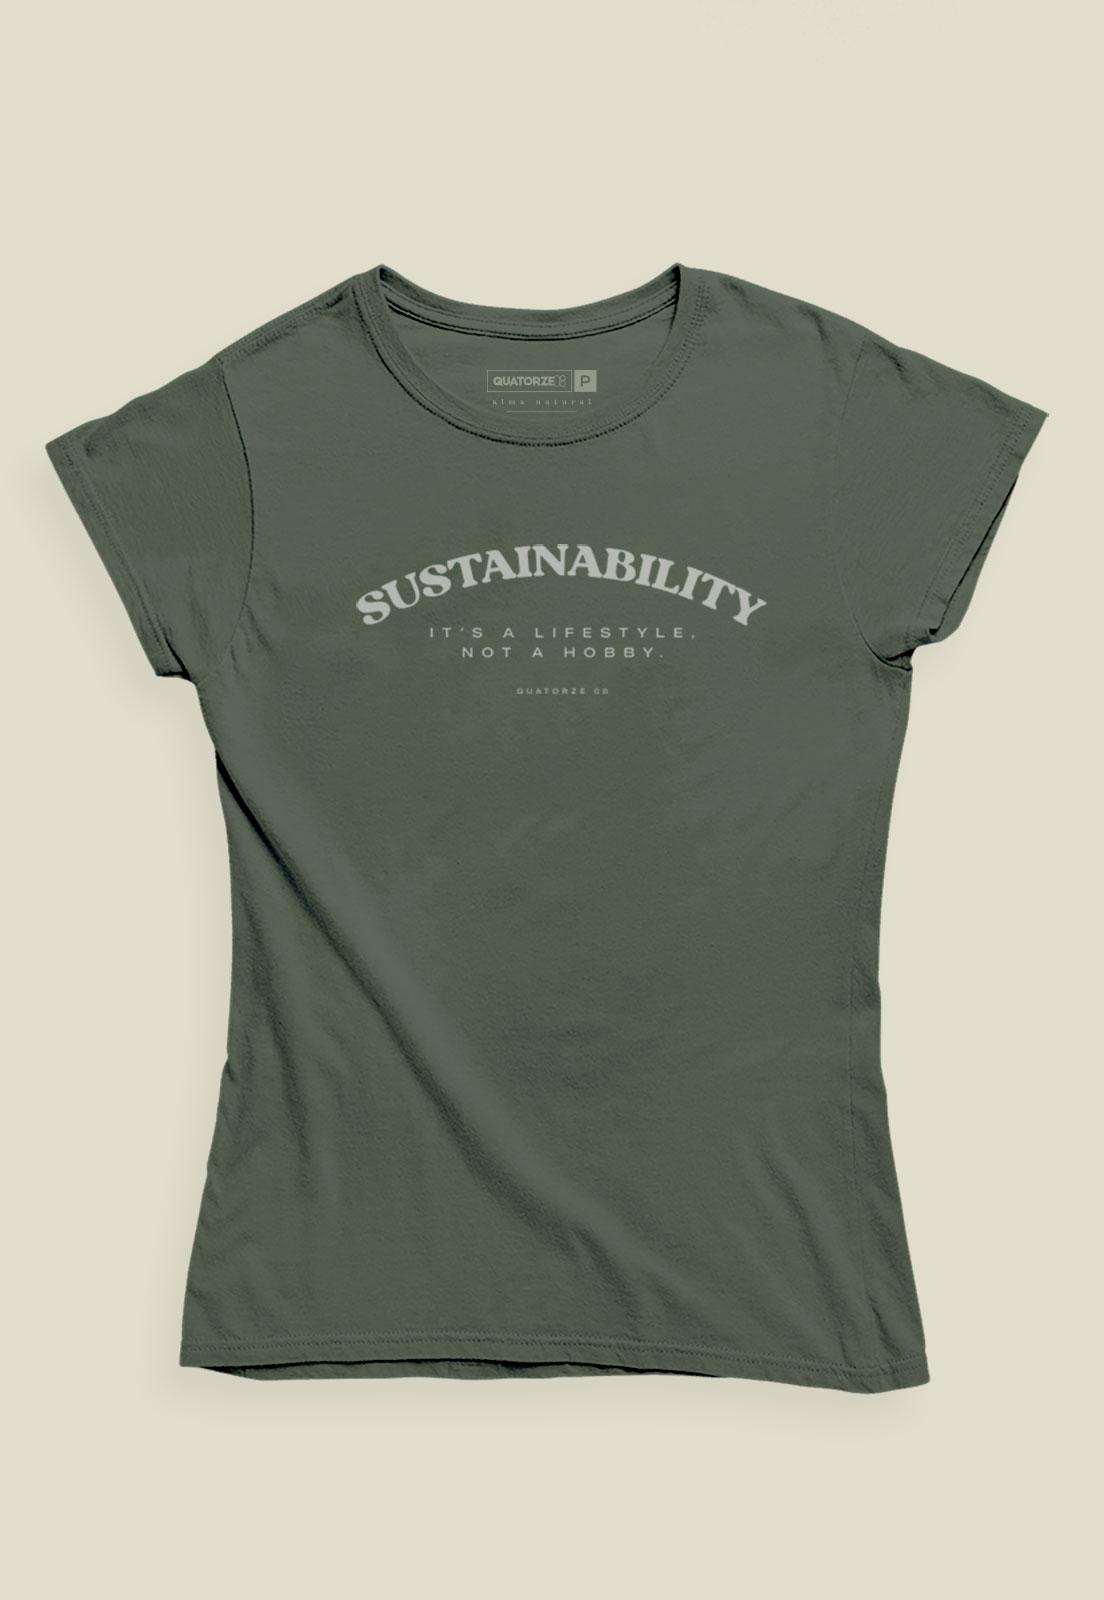 Camiseta Feminina Verde Escuro Estonada de Algodão Sustainability